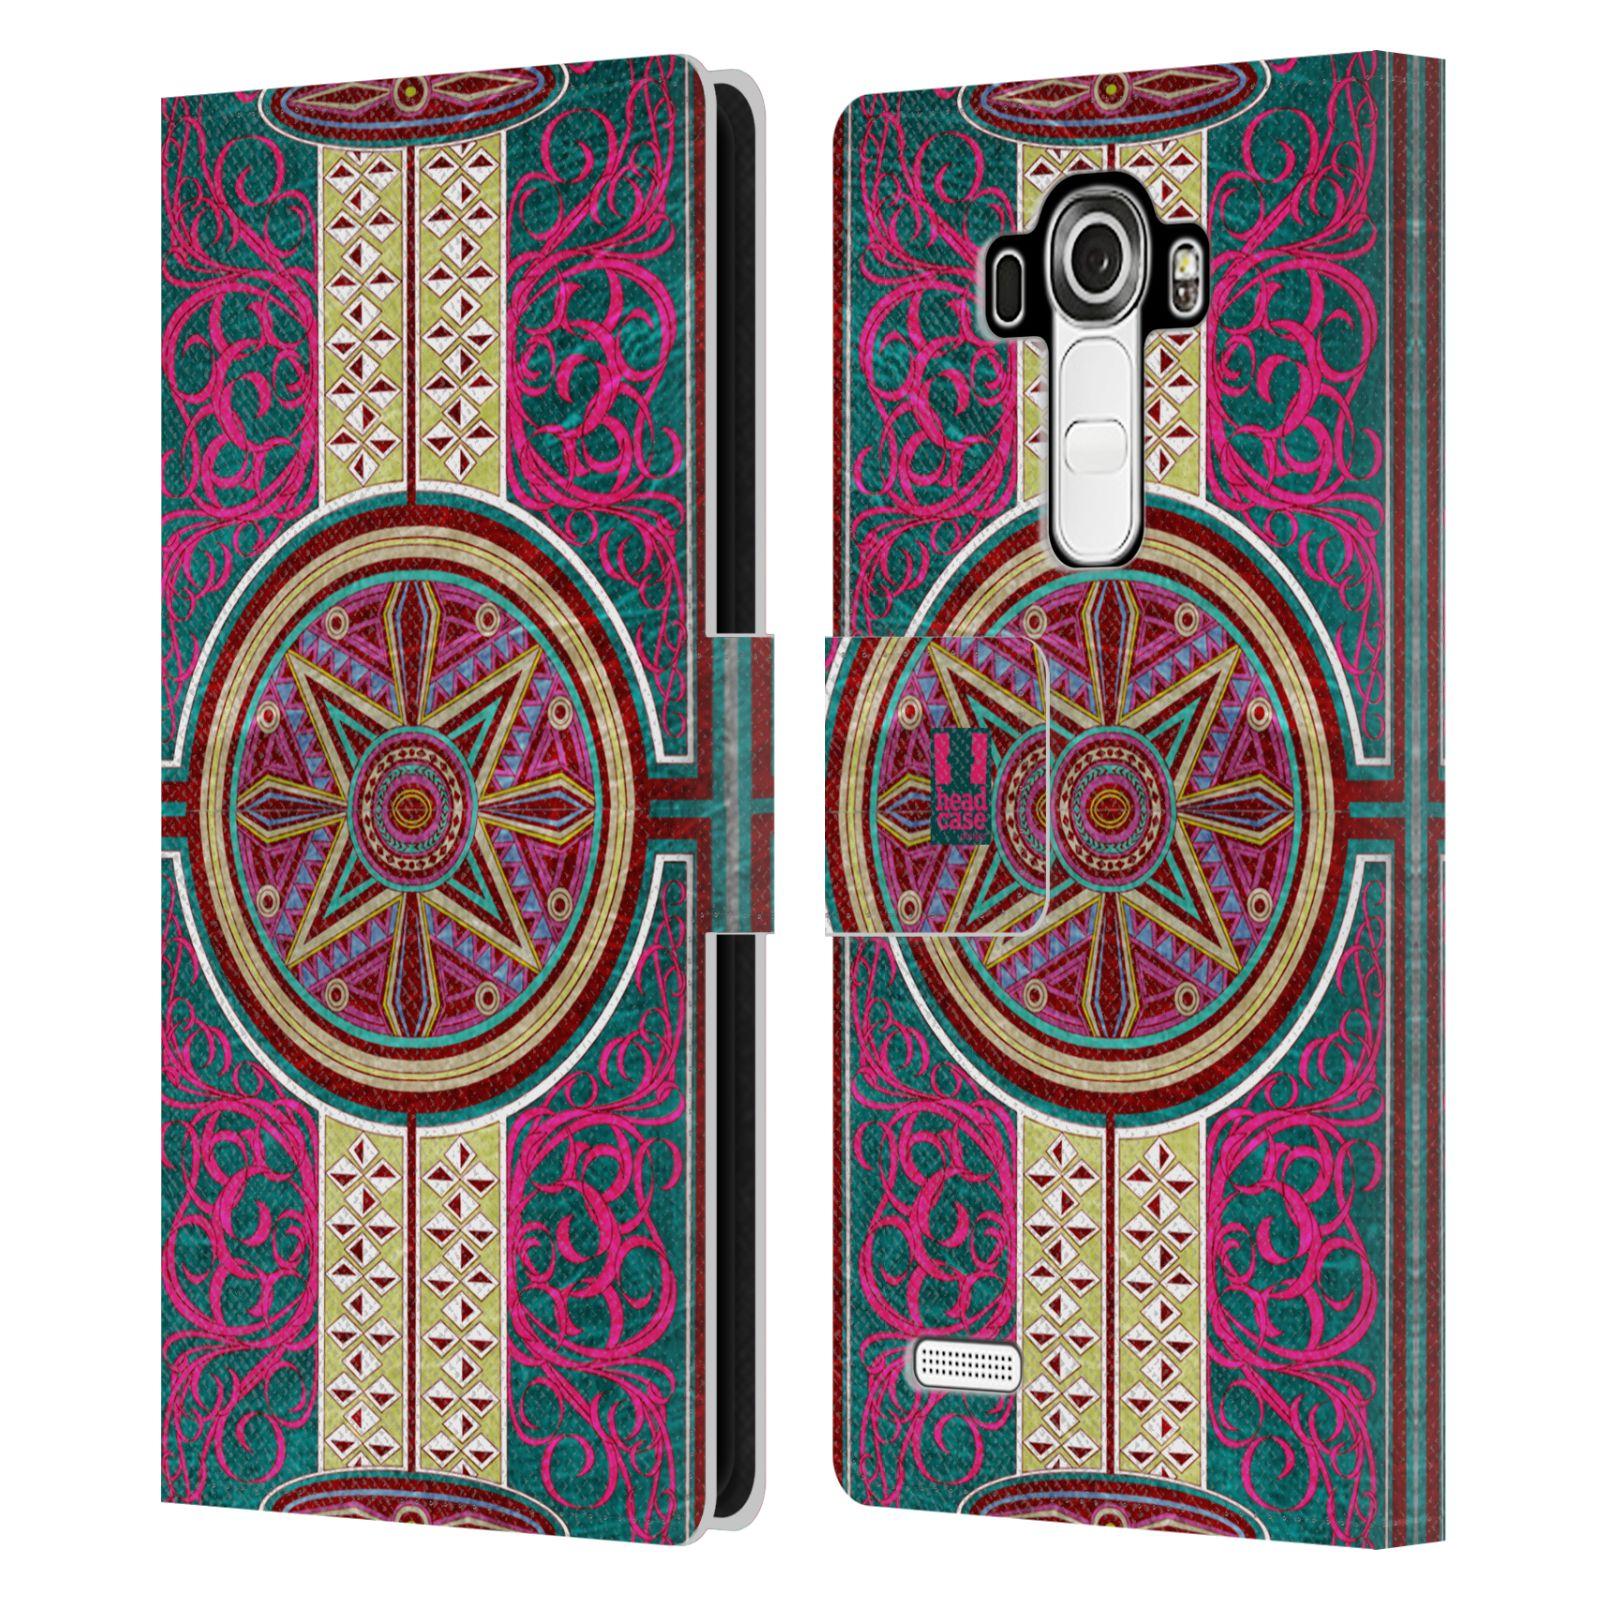 HEAD CASE Flipové pouzdro pro mobil LG G4 (H815) ARABESKA Baroko rudá kruh